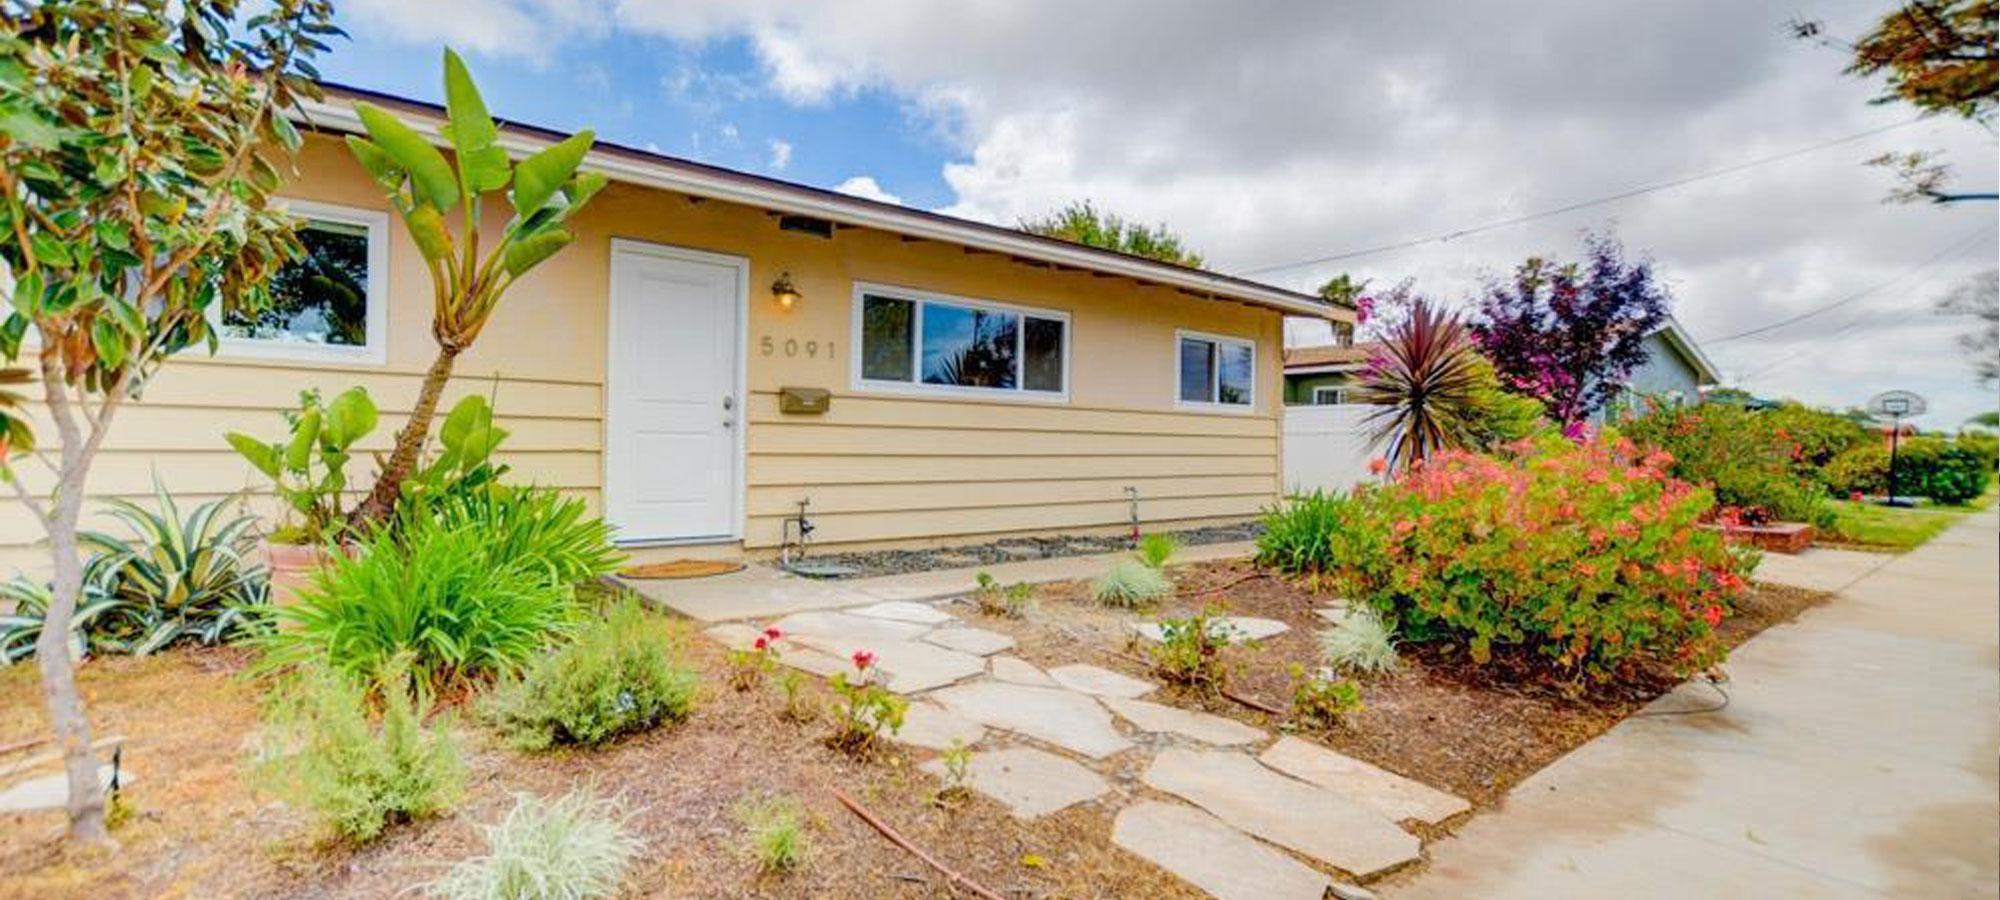 5093 Roscrea Ave. San Diego, CA 92117